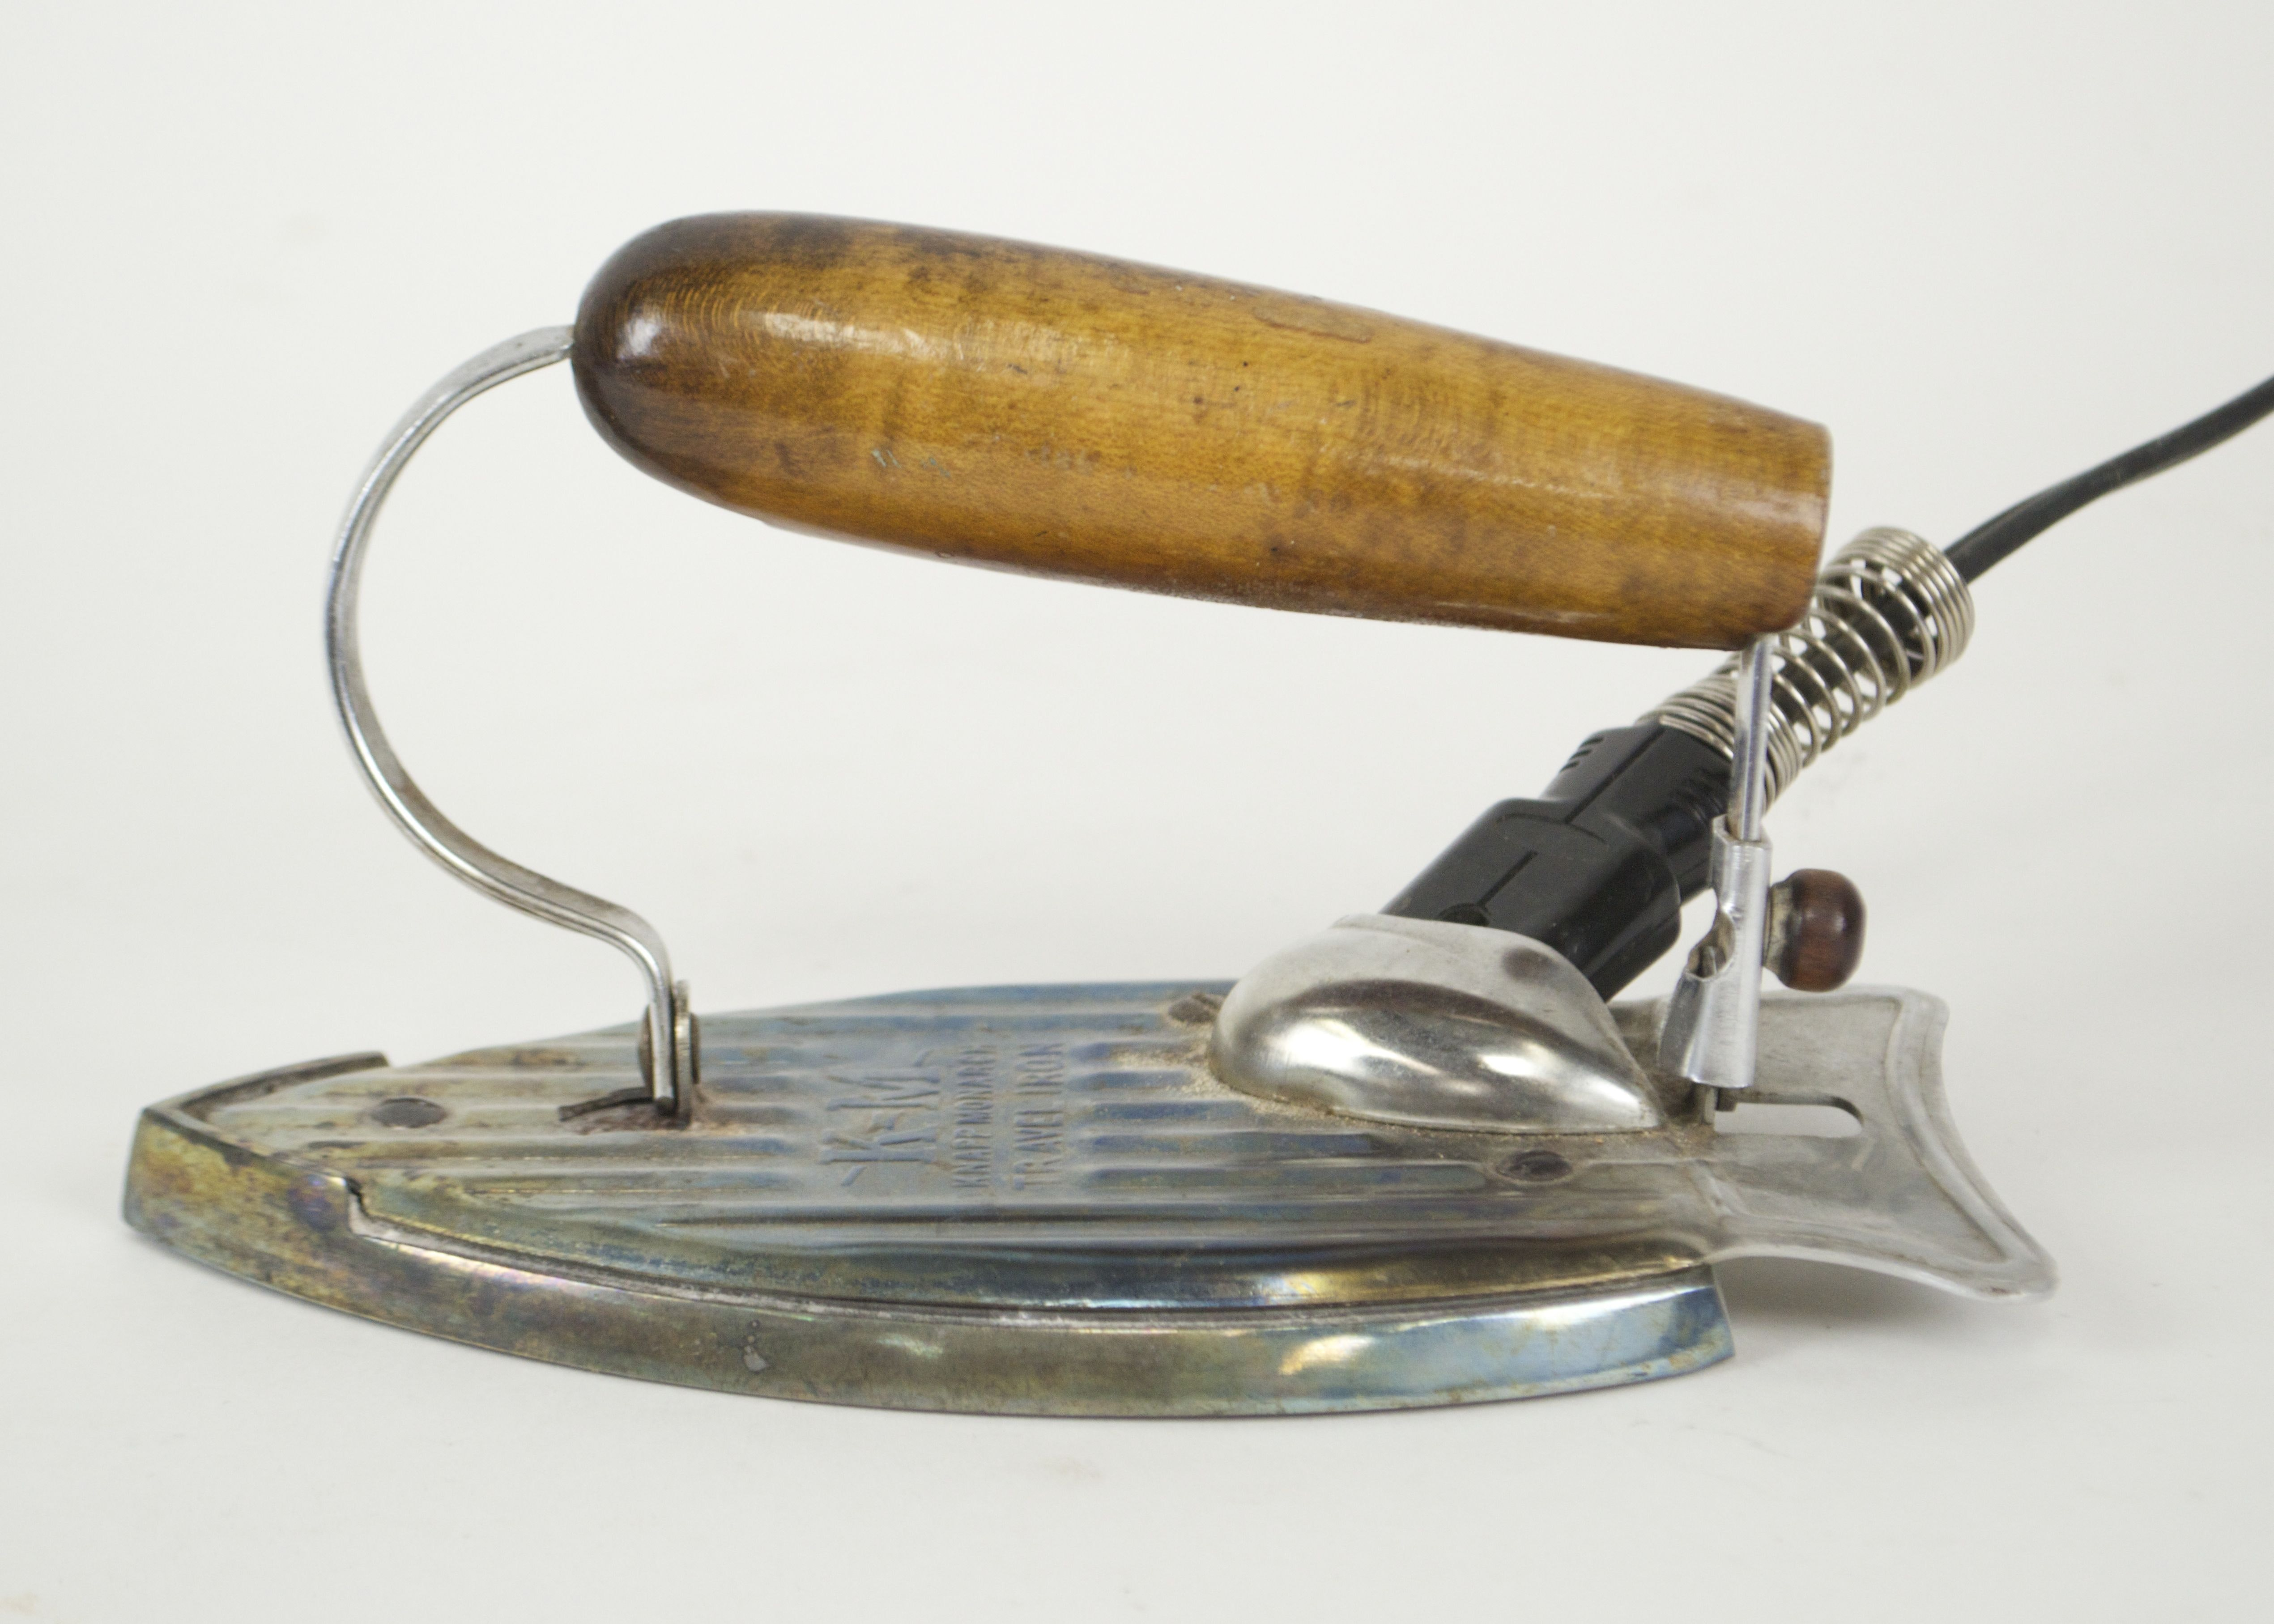 Vintage Knapp Monarch Travel Iron